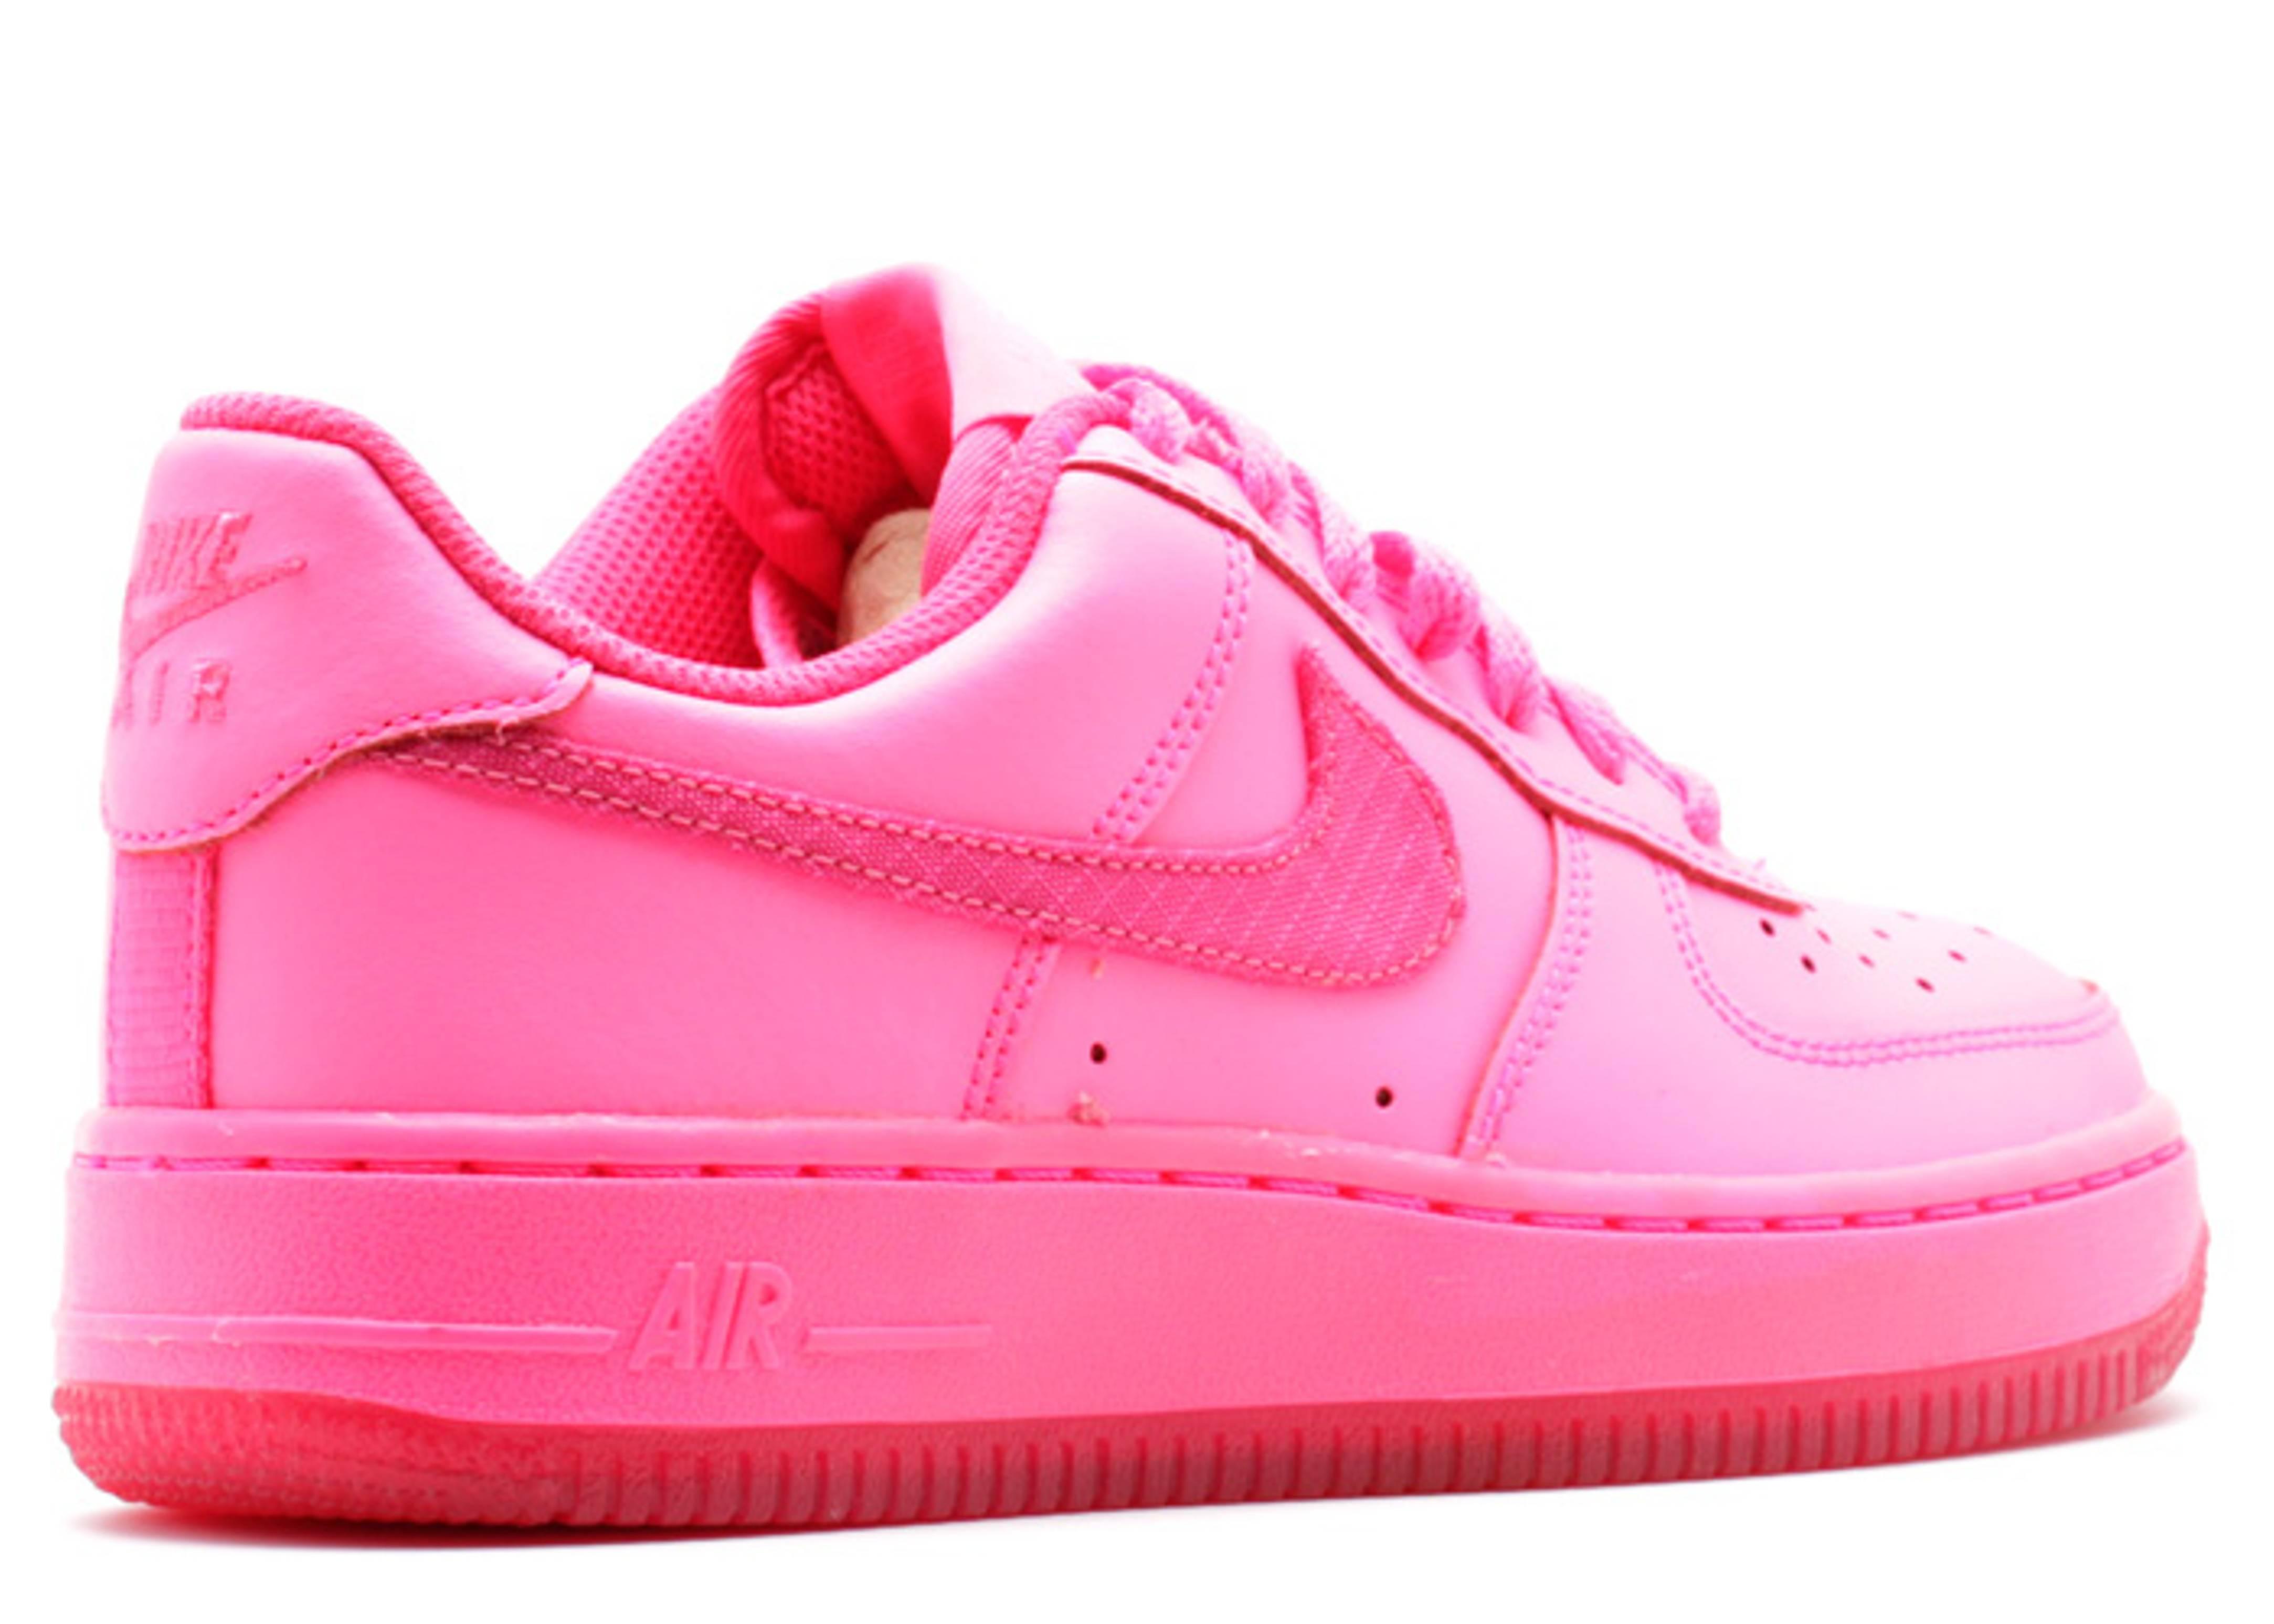 Nike Air Force 1 Hyper Pink Cement par sneakersmadame